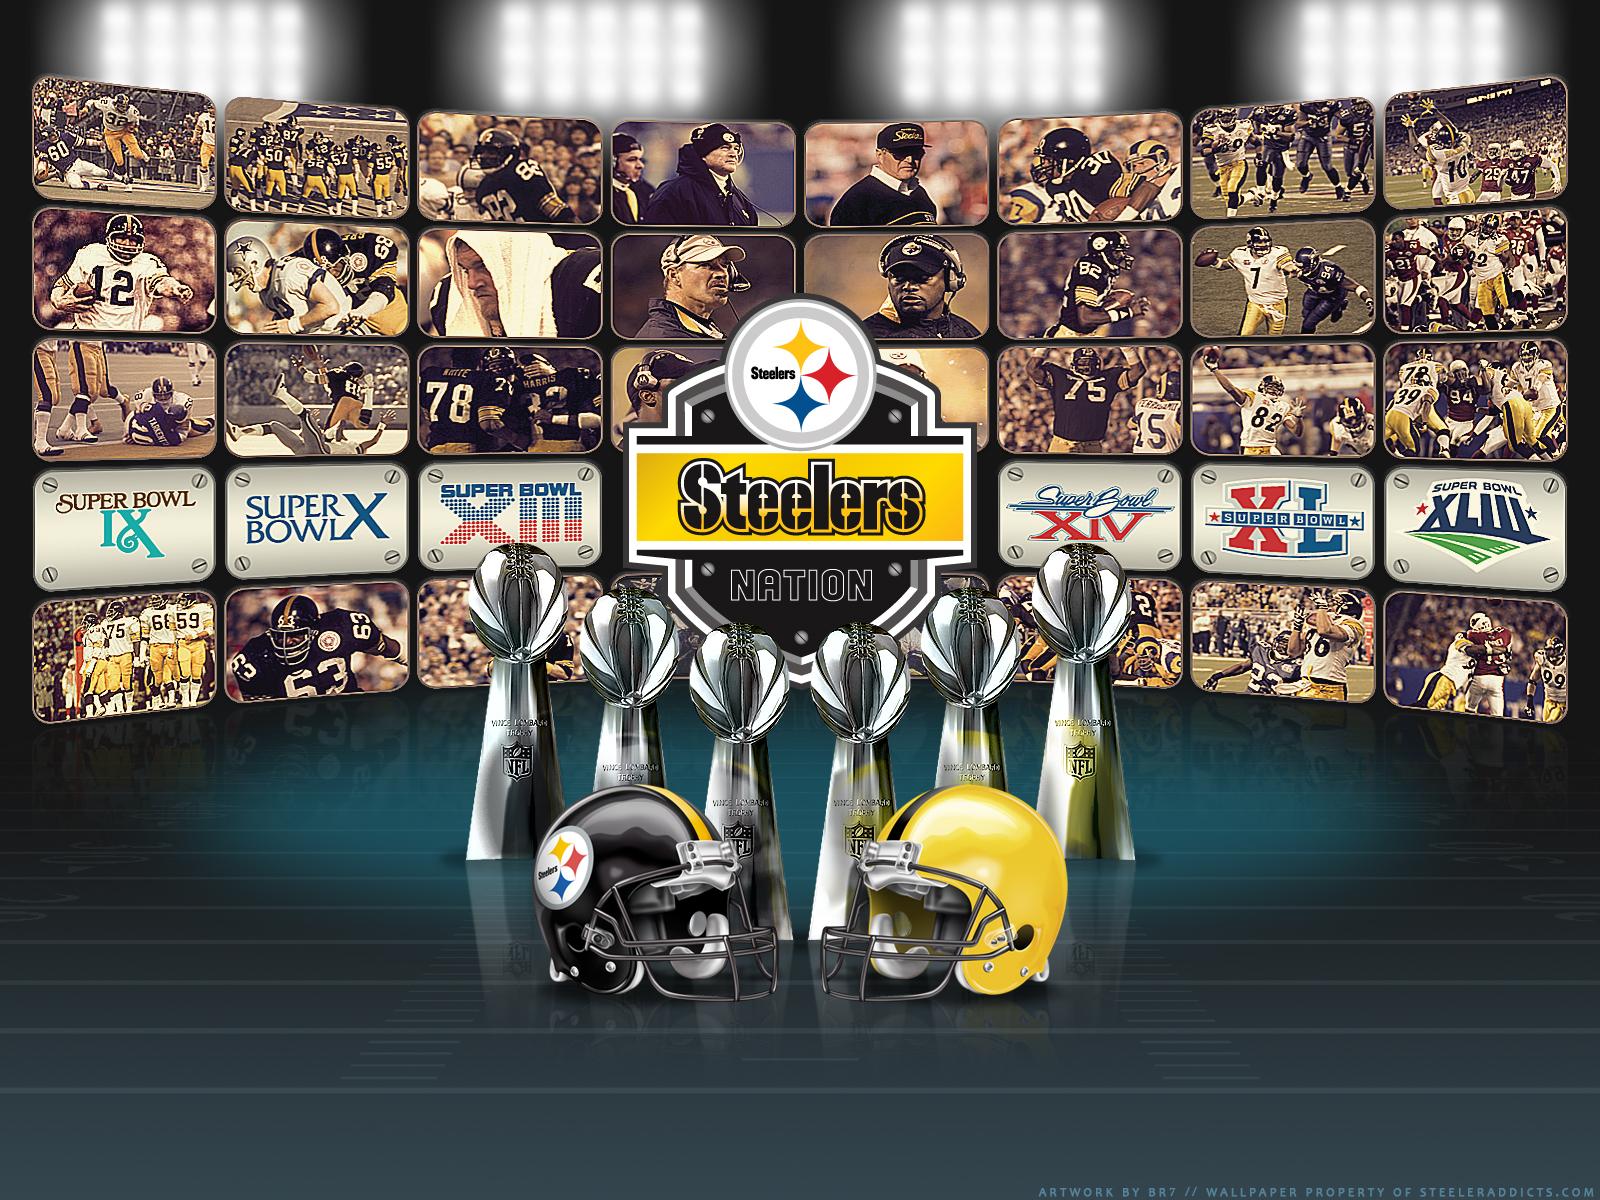 Pittsburgh Steelers Wallpaper 69 Download Screensavers 1600x1200